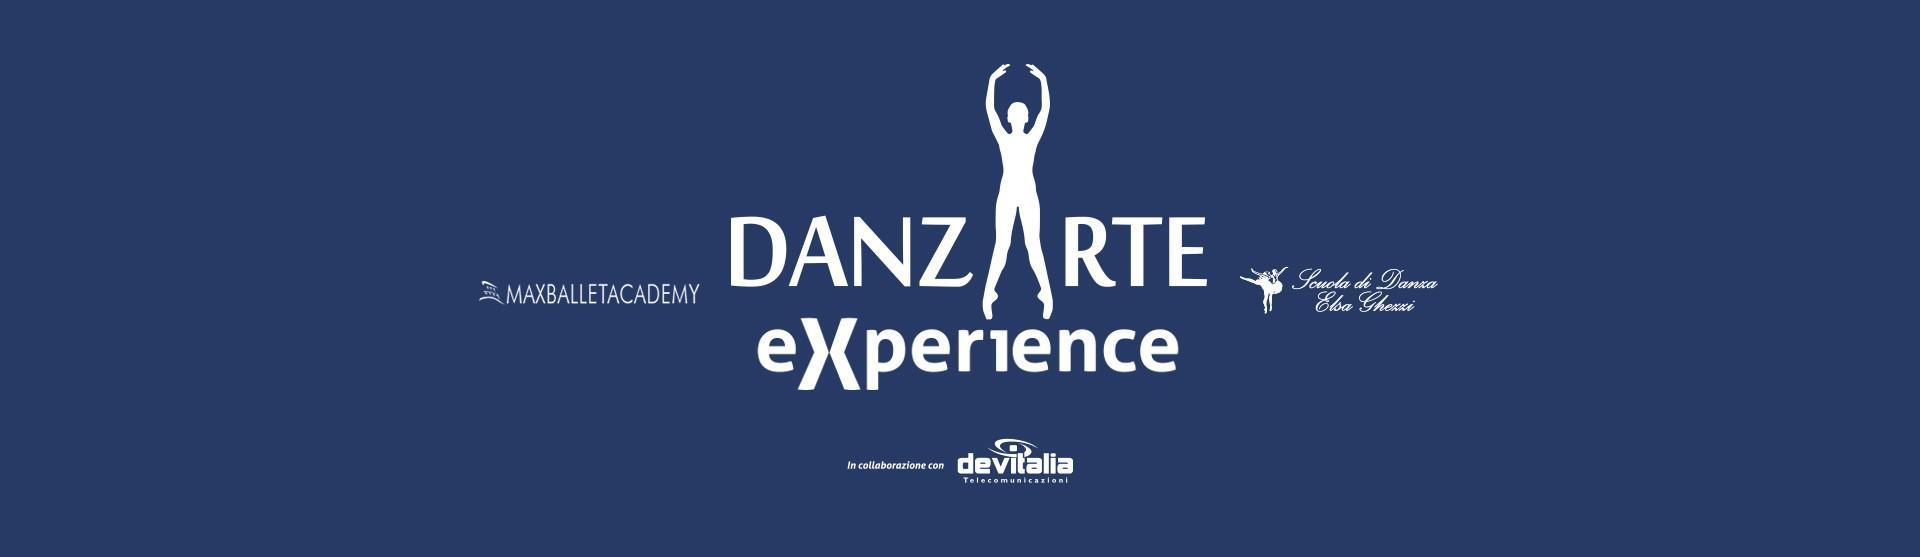 DanzArte eXperience 2019